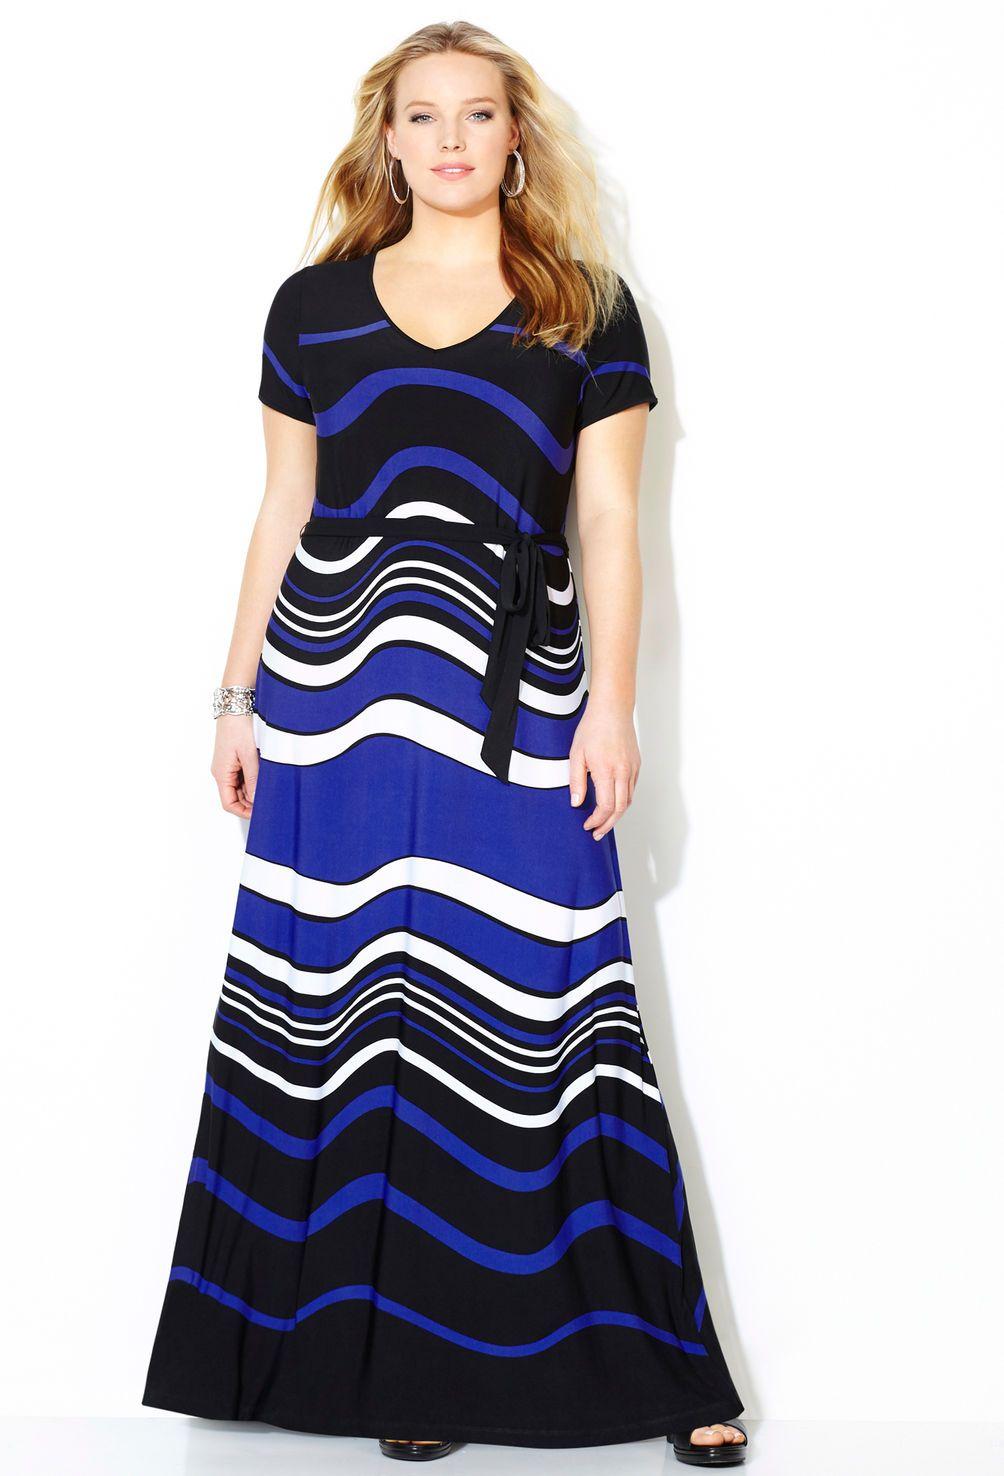 Dip dye chevron maxi dressplus size dressavenue things i am